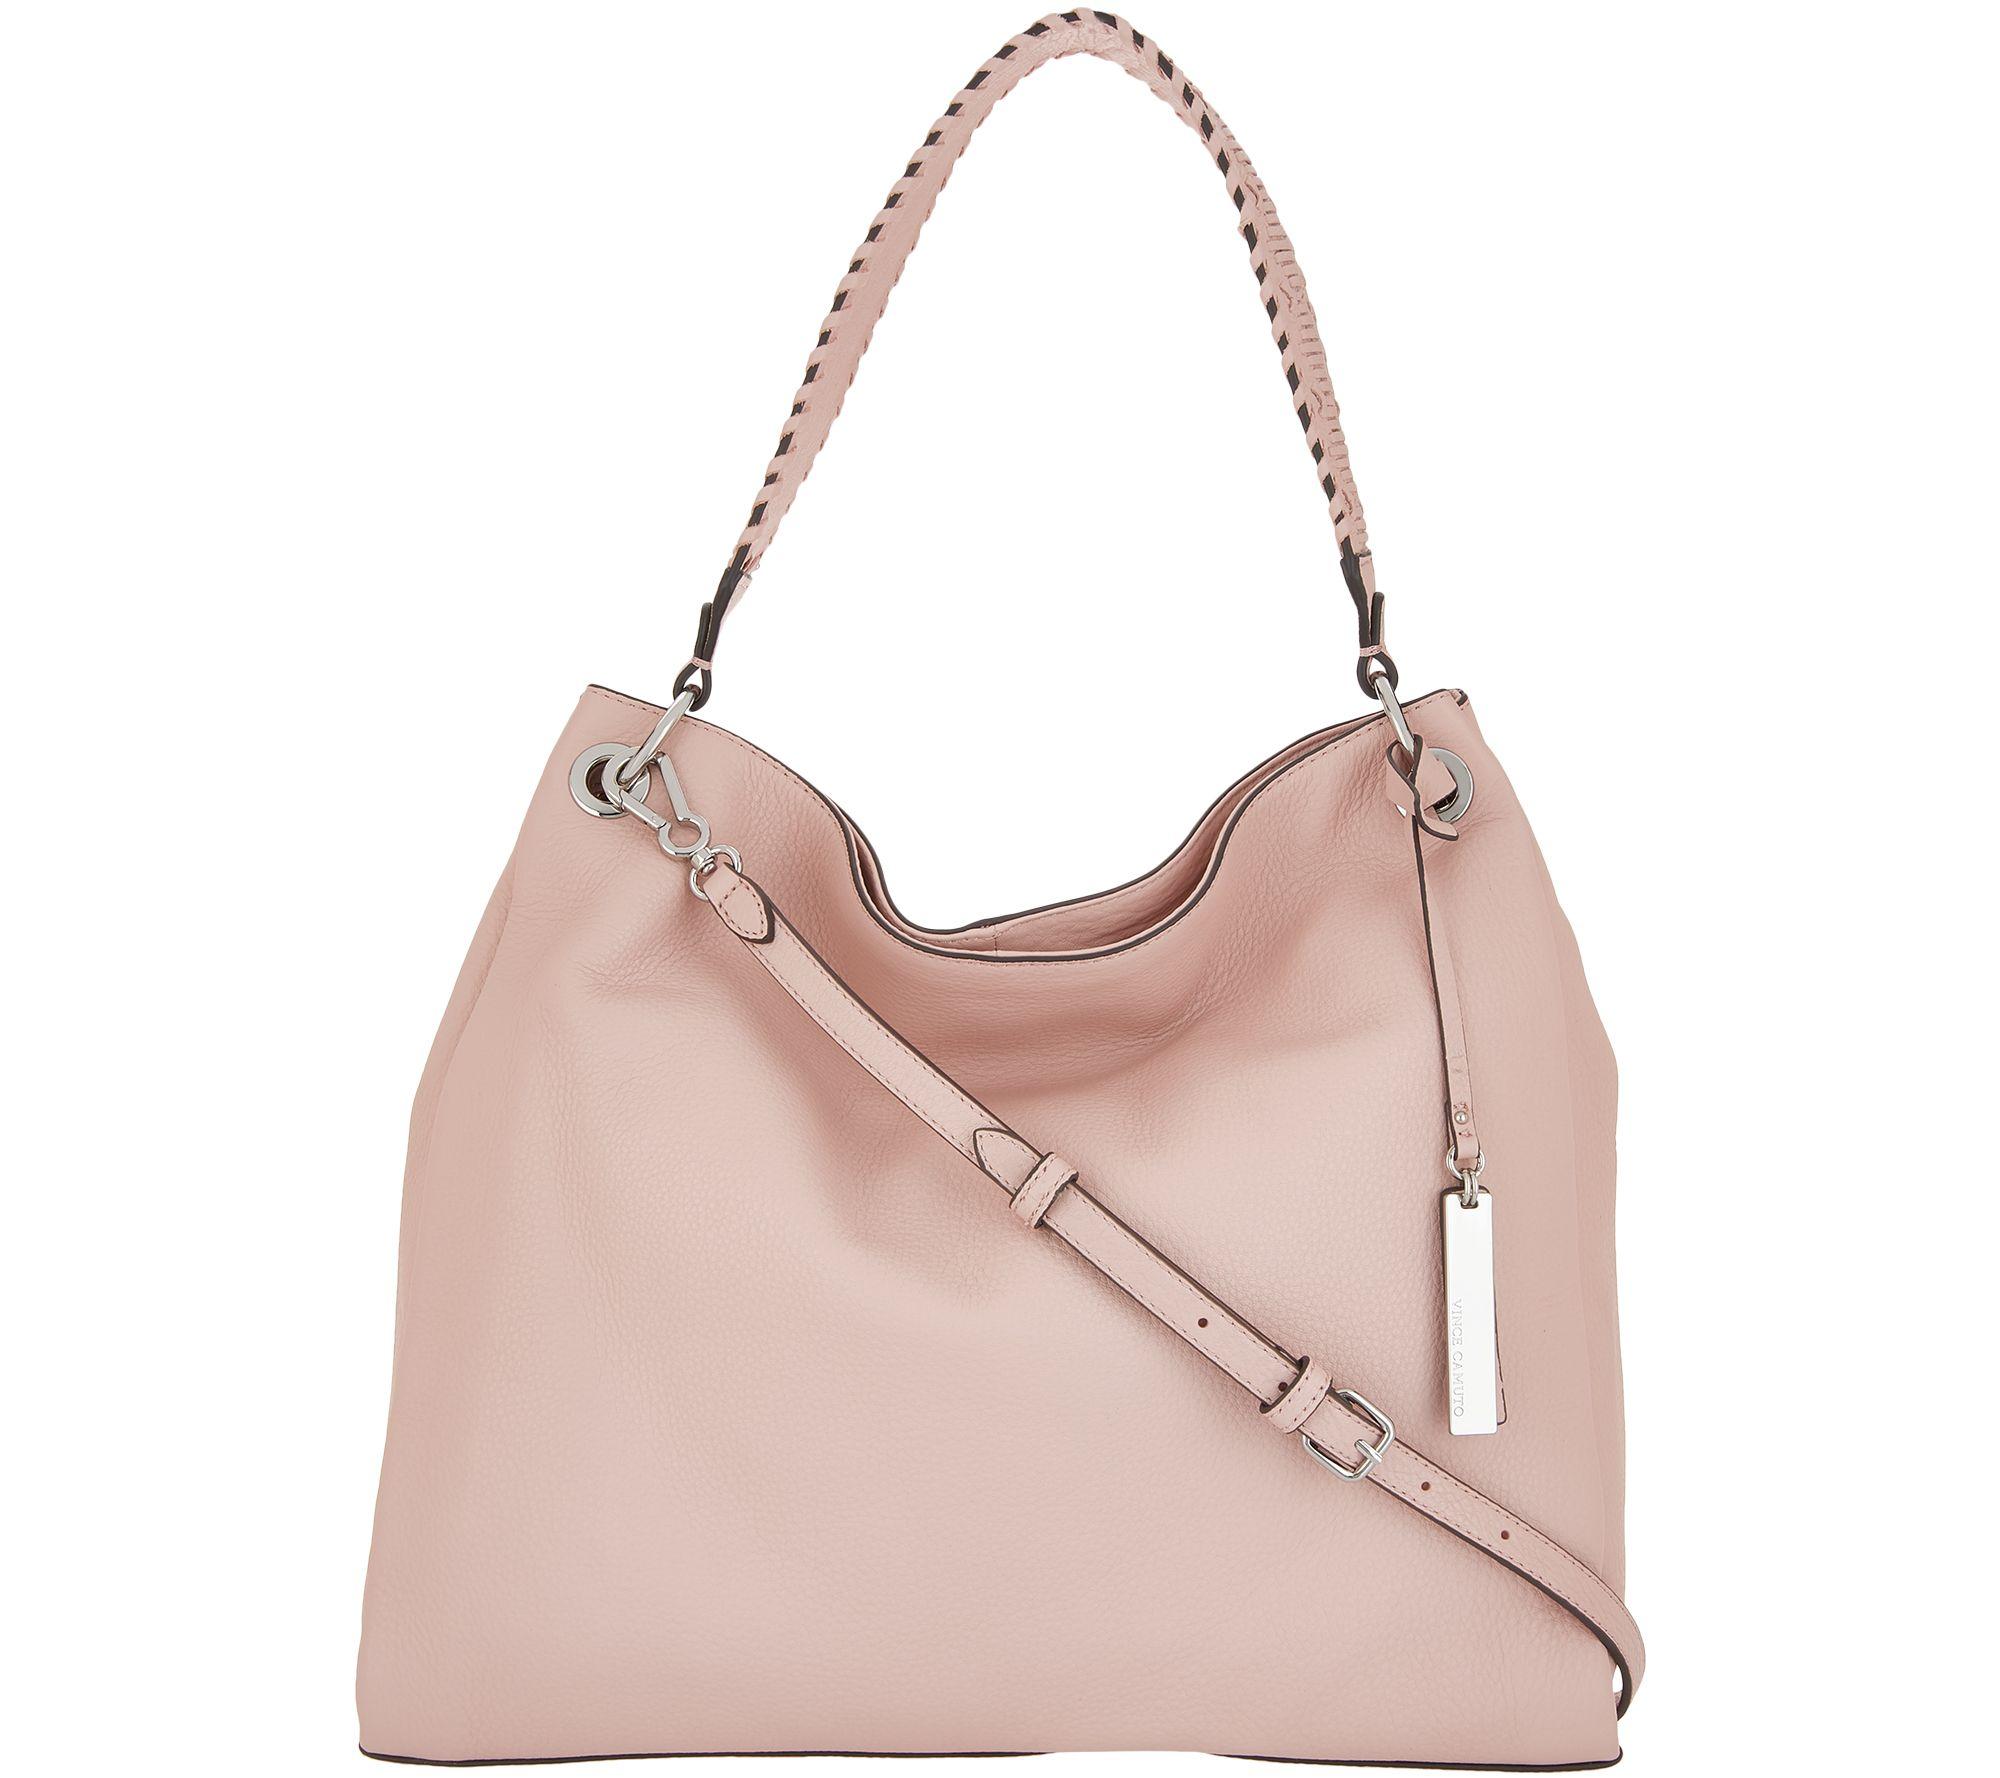 4a818093b Vince Camuto Leather Hobo Handbag - Nadja - Page 1 — QVC.com